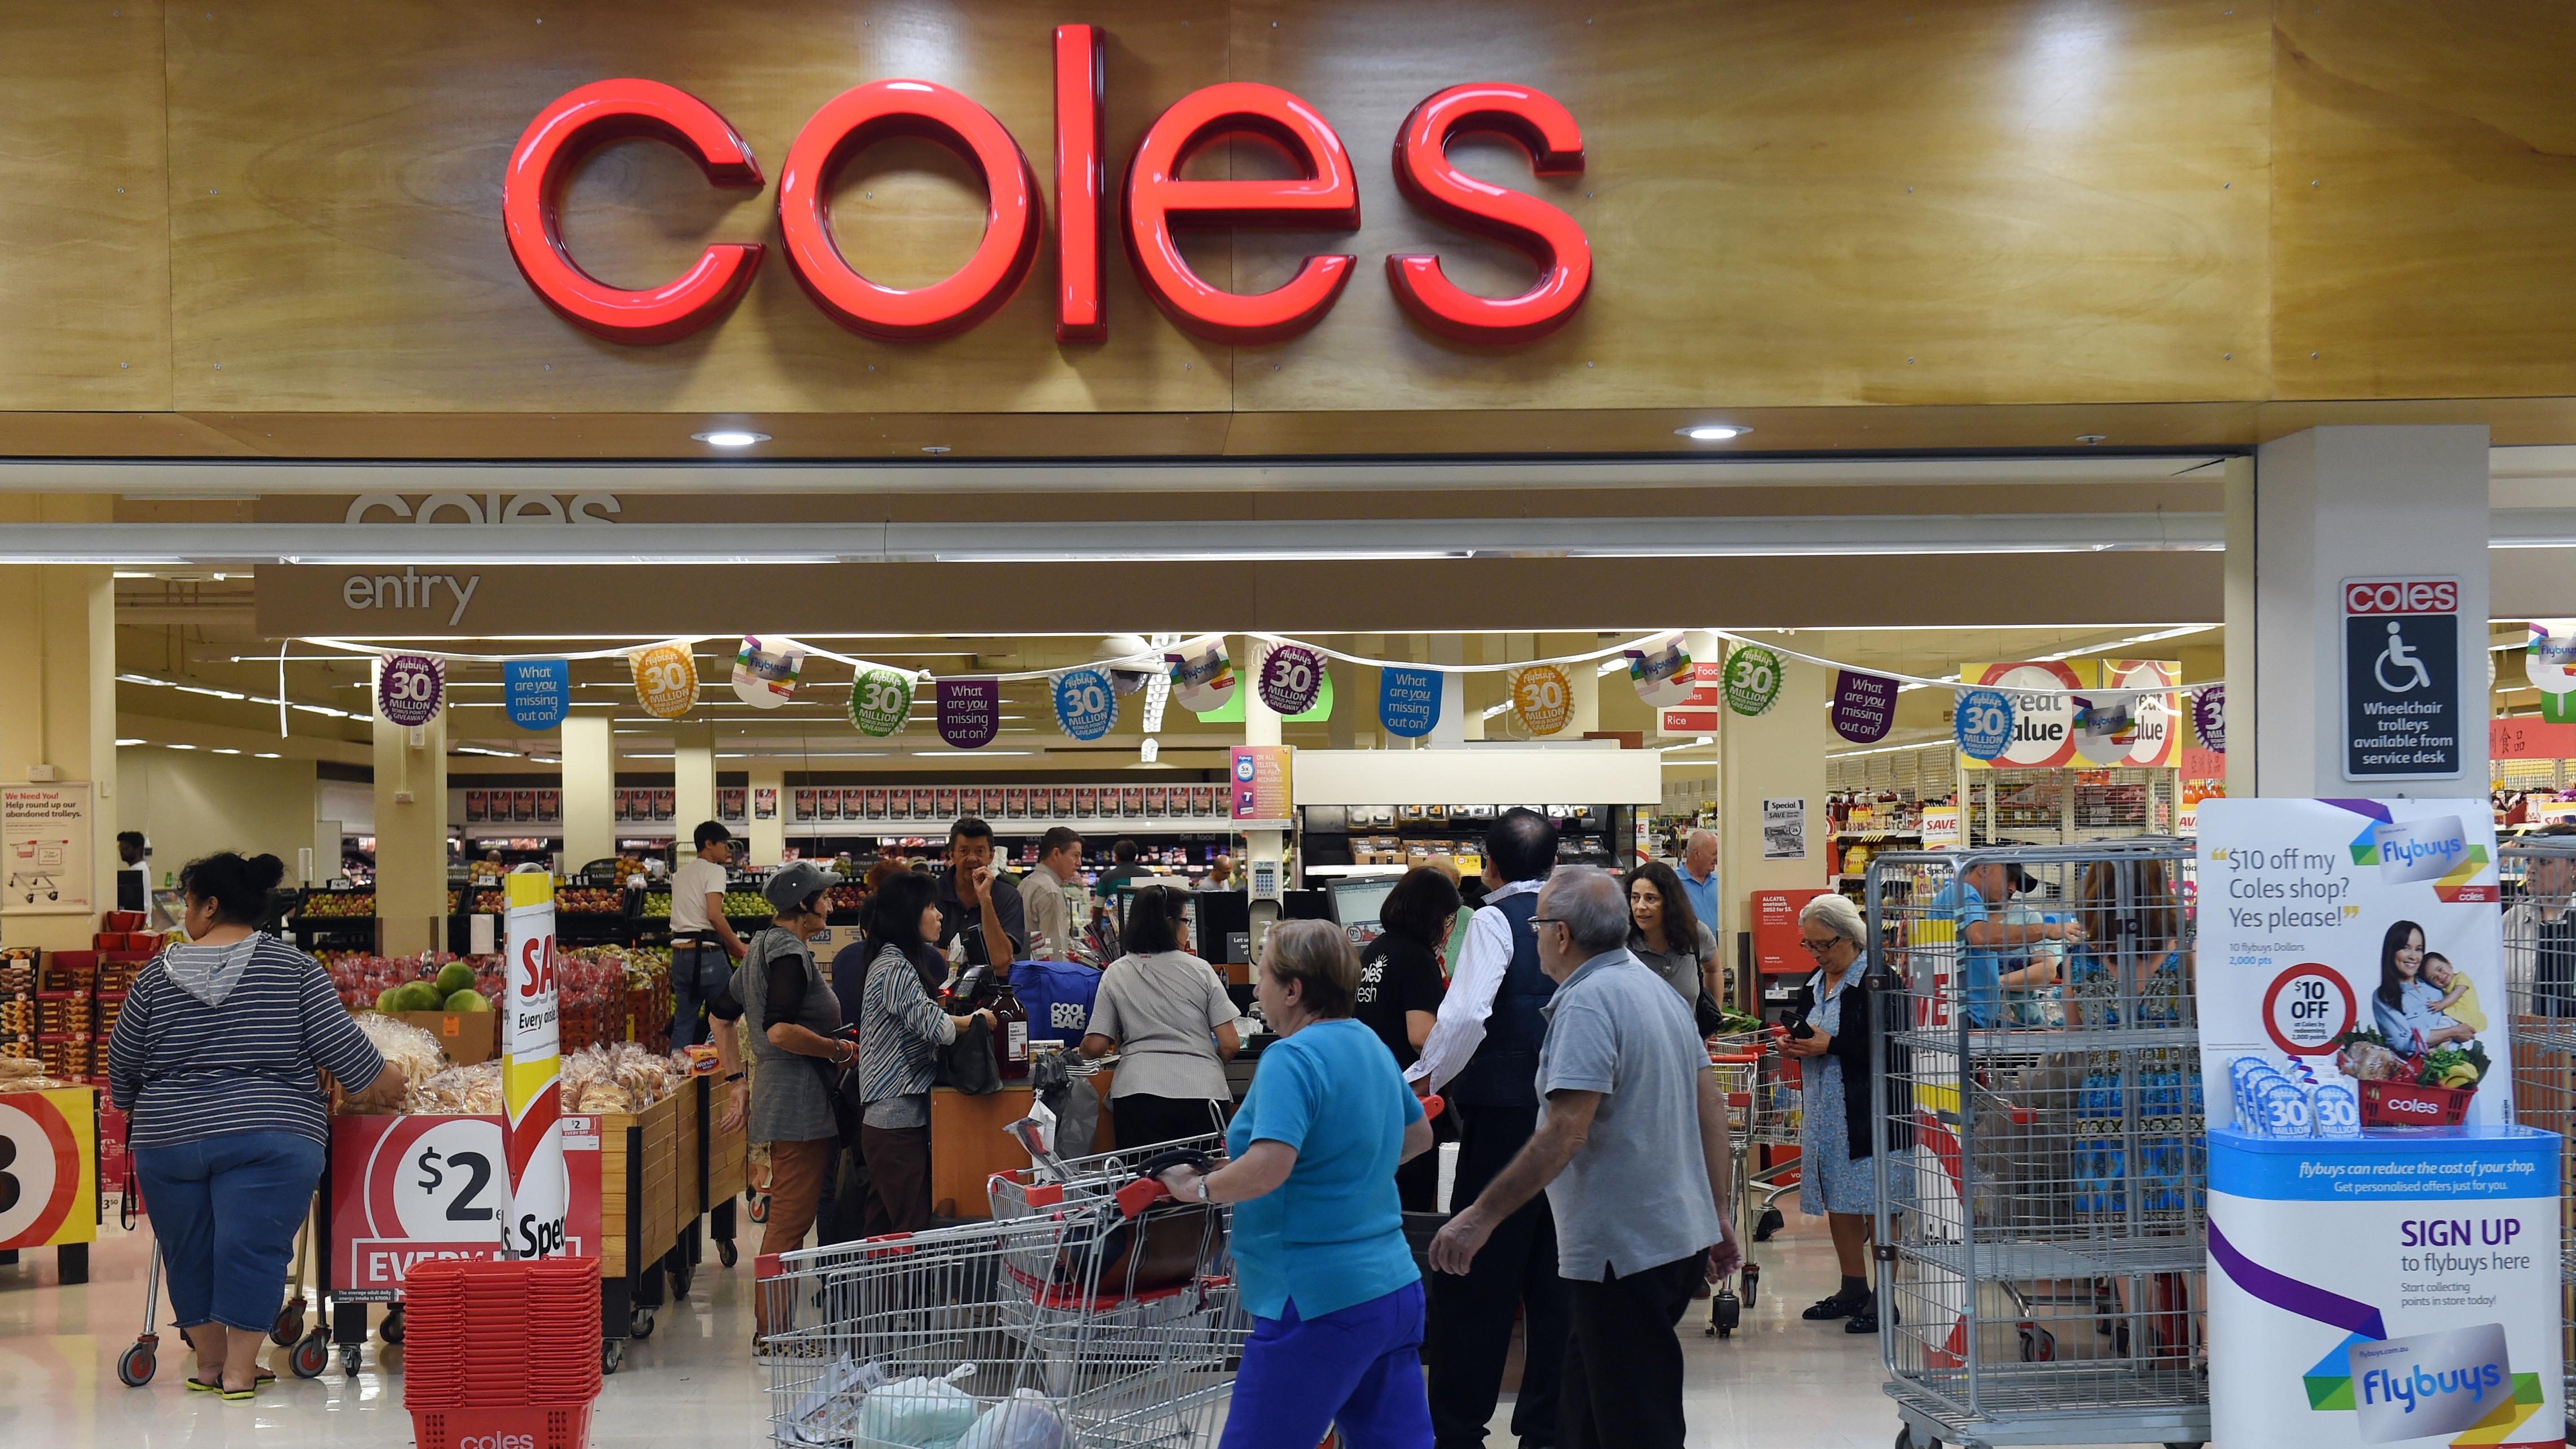 Coles limits self-serve checkout to 12 items